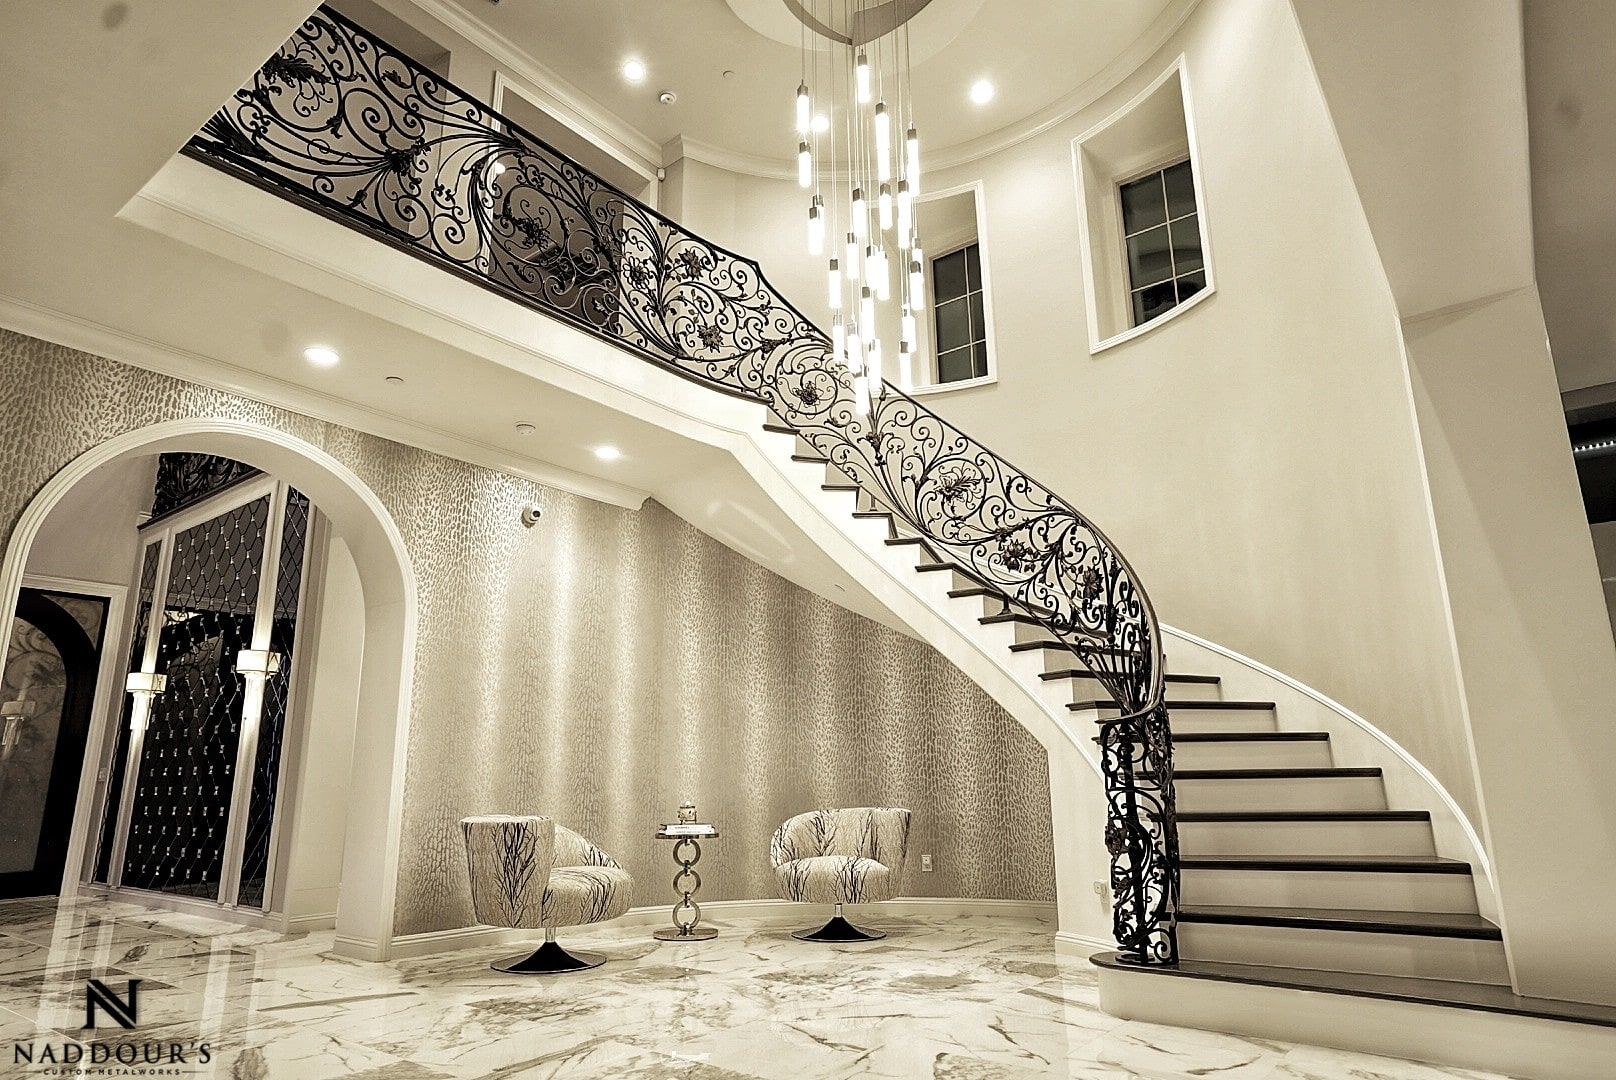 Naddour's Custom Metalworks Custom Staircase Railing Featured Project in Portola Hilla California .jpg 2.jpeg